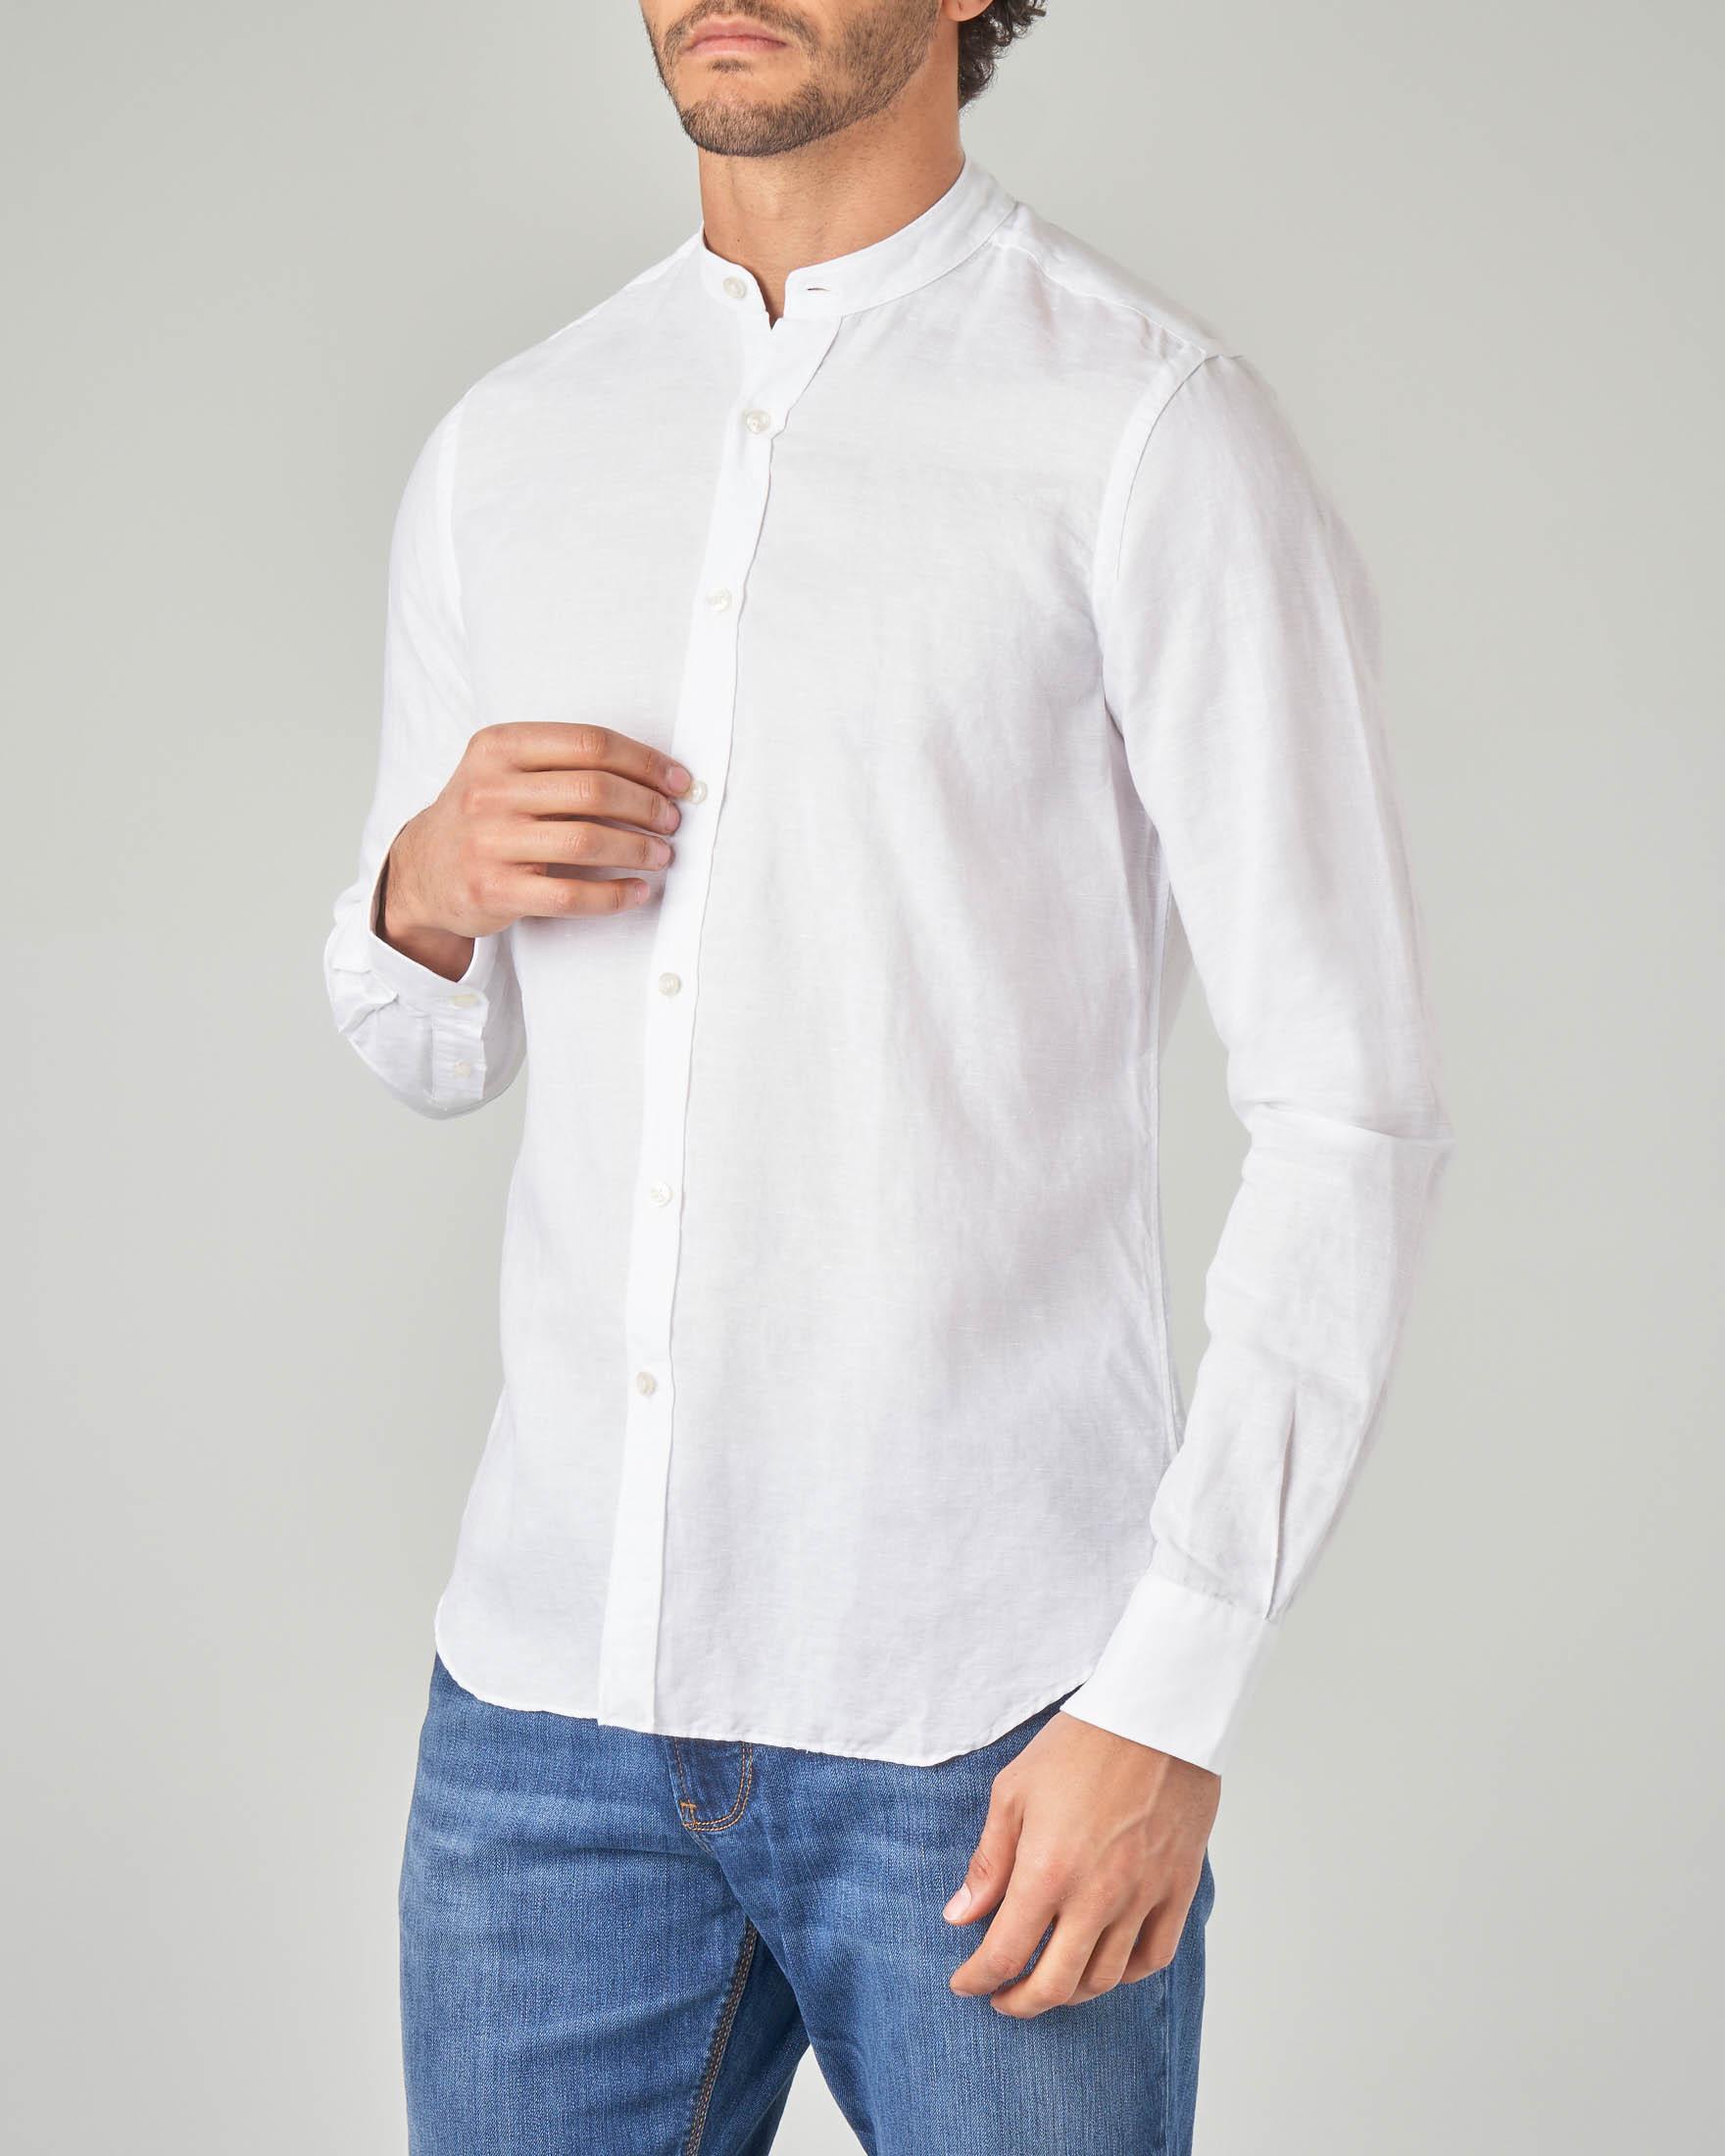 Camicia bianca coreana